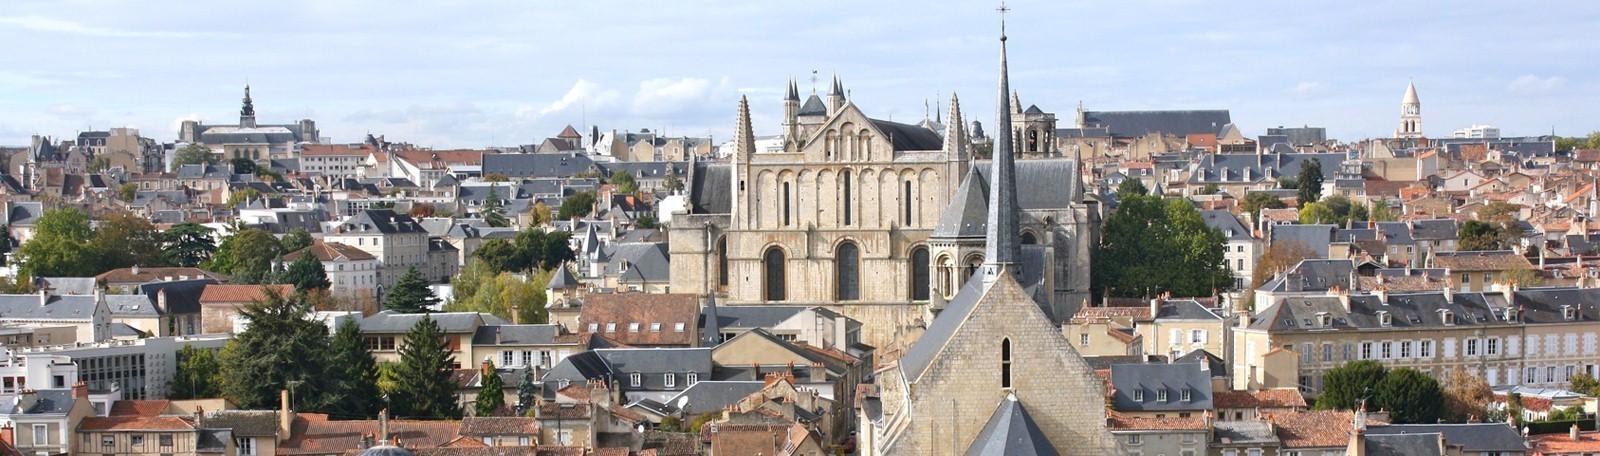 Parking Les Cordeliers - 4 bis Rue Henri Oudin 86000 Poitiers